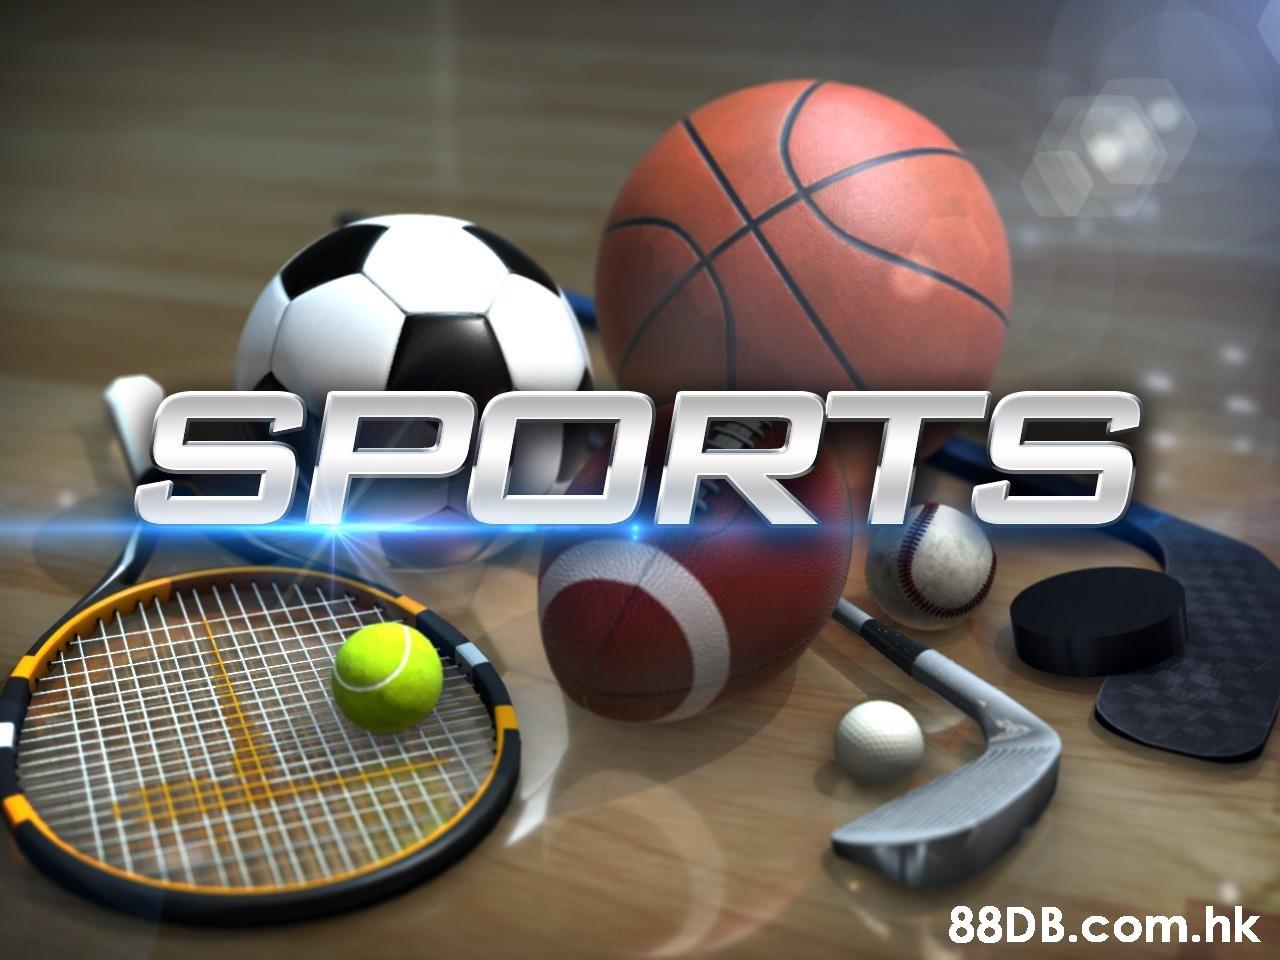 SPORTS .hk  Ball game,Ball,Sports,Soccer ball,Sports equipment